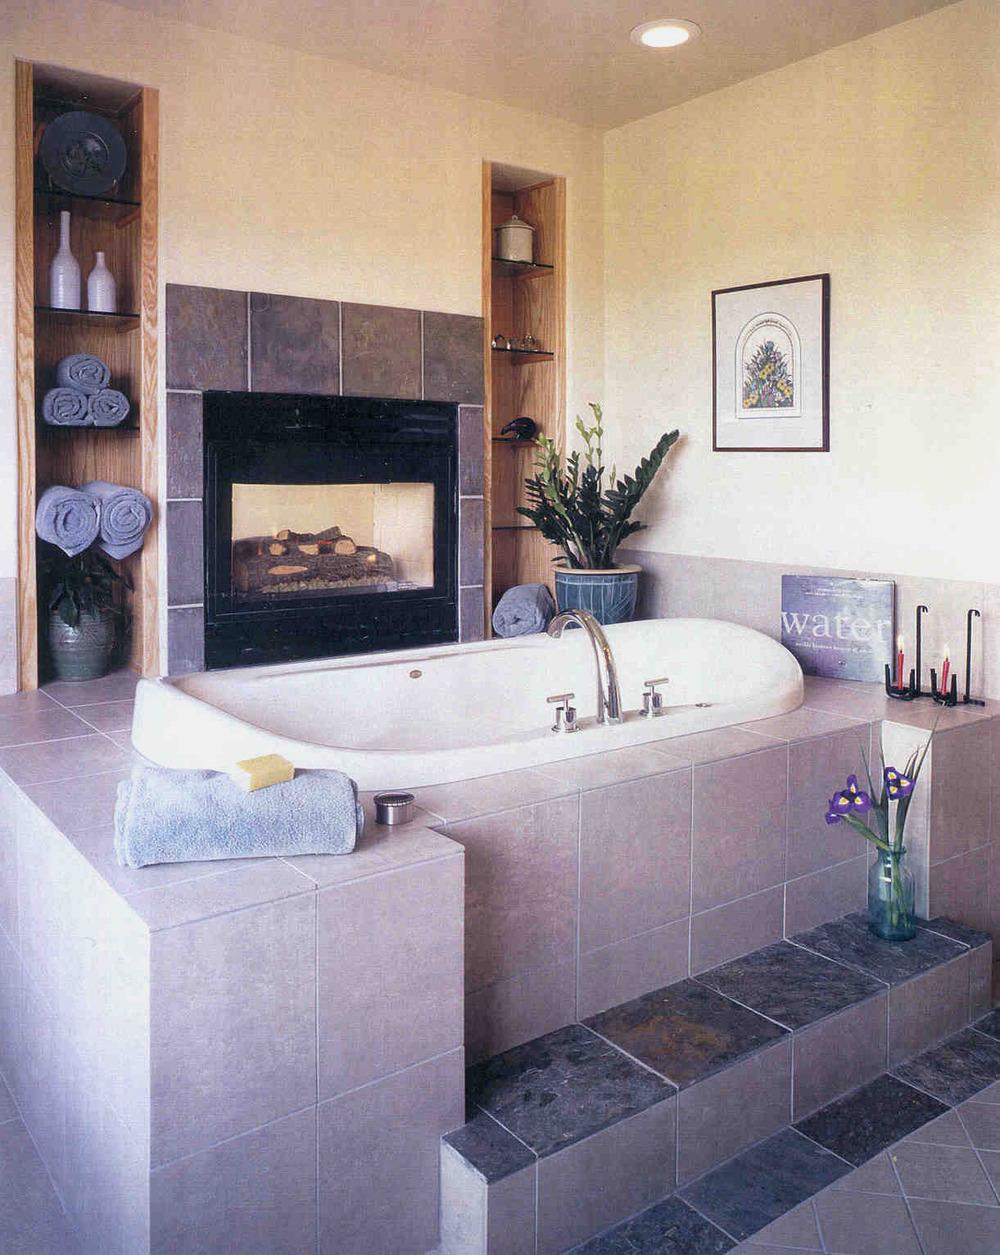 L26 Bath.jpg